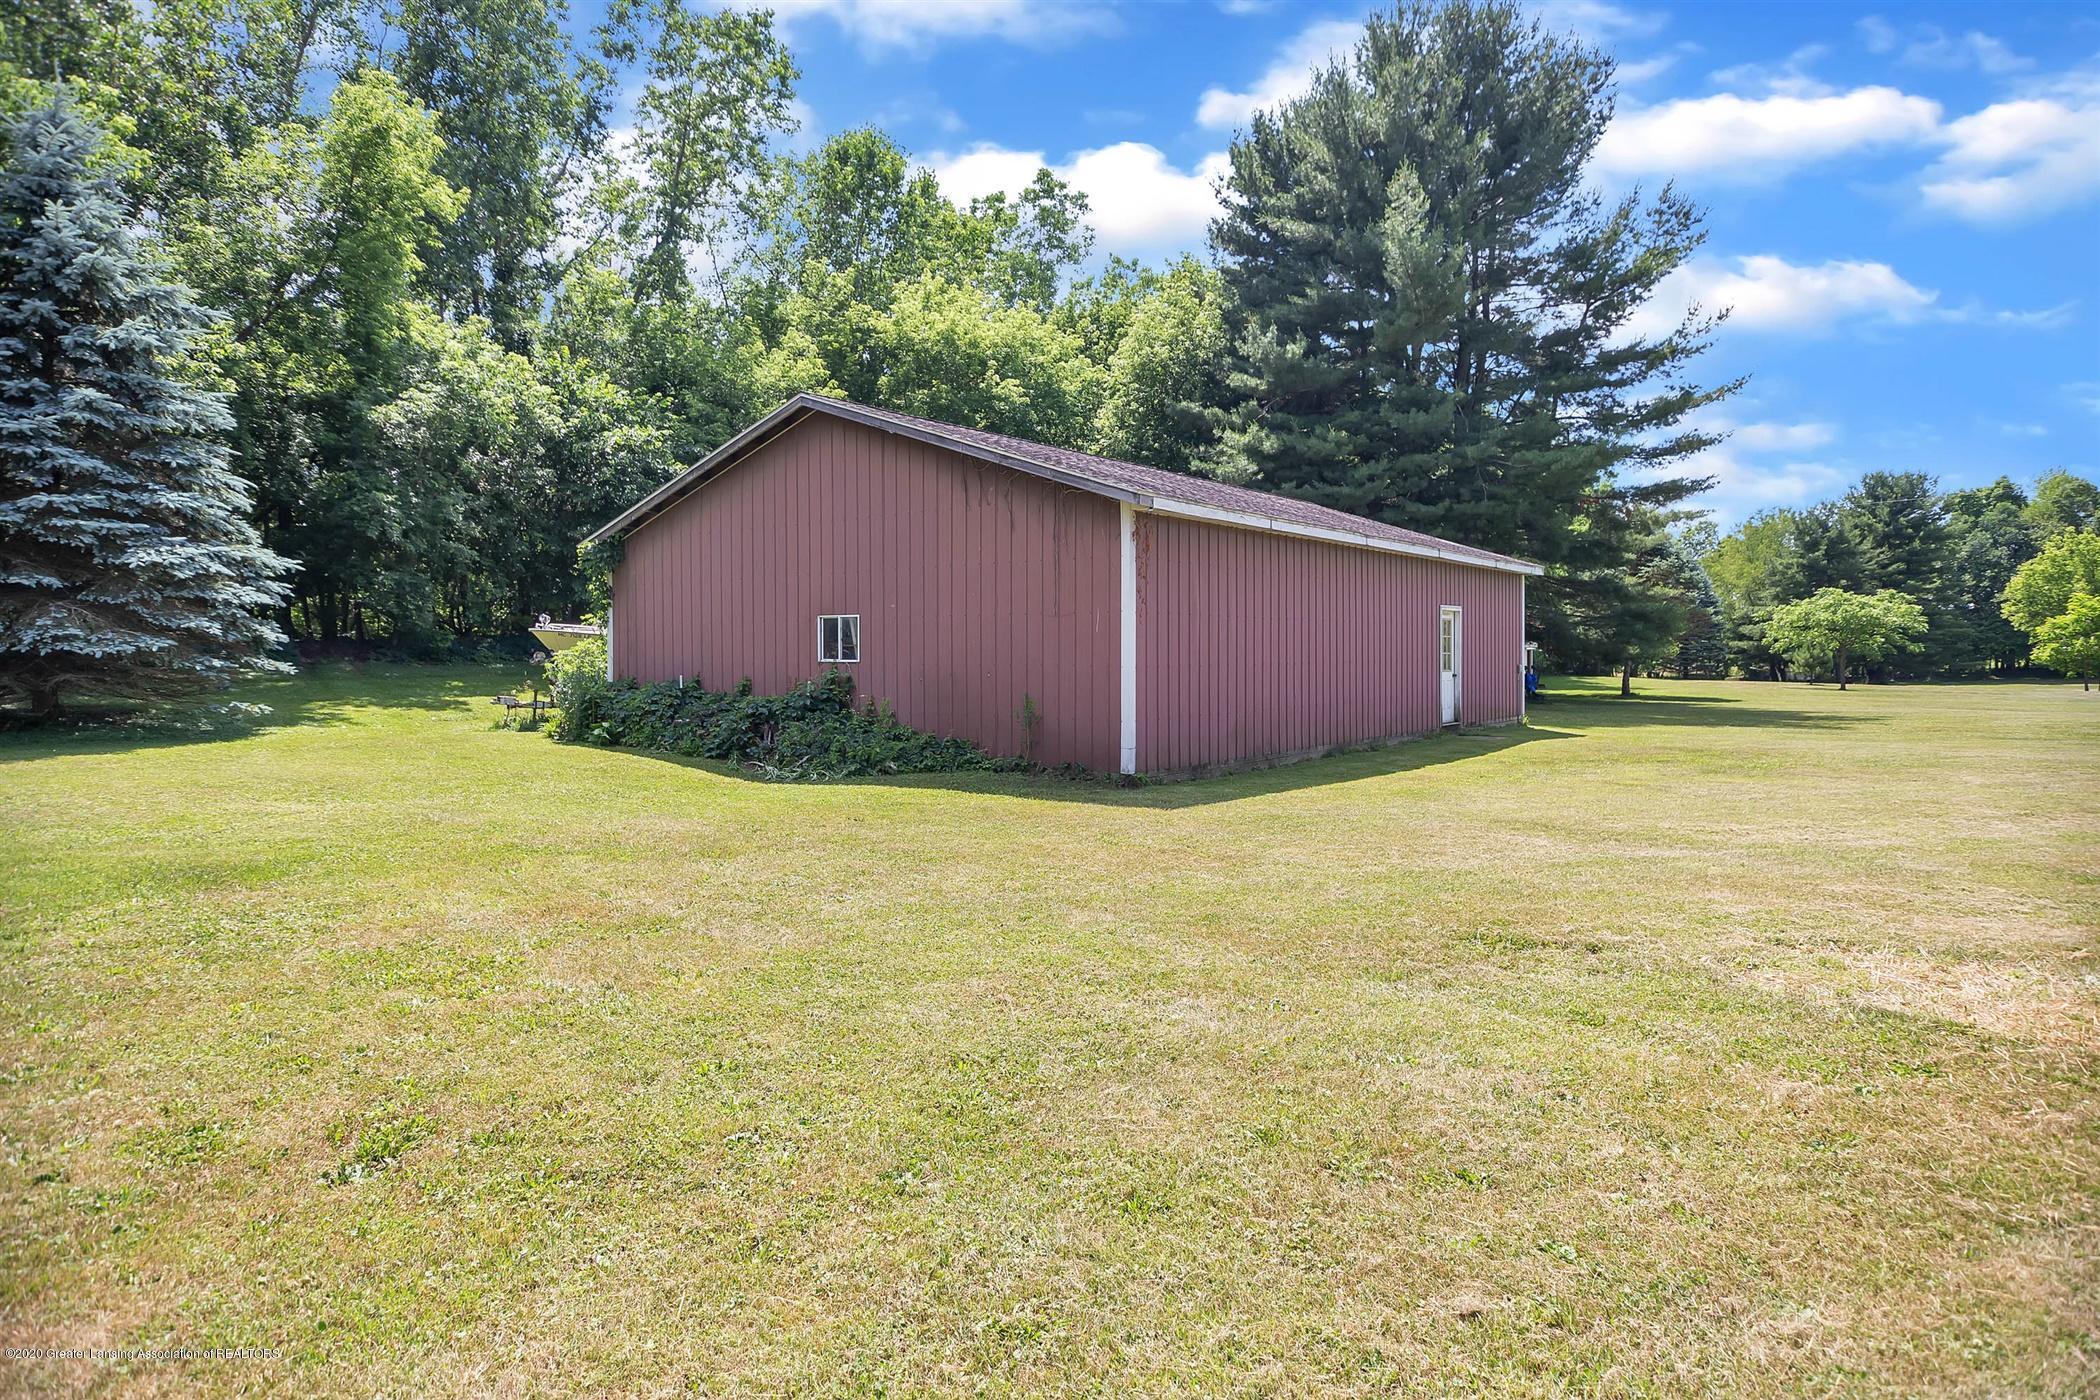 4445 W Britton Rd - EXTERIOR Barn - 4